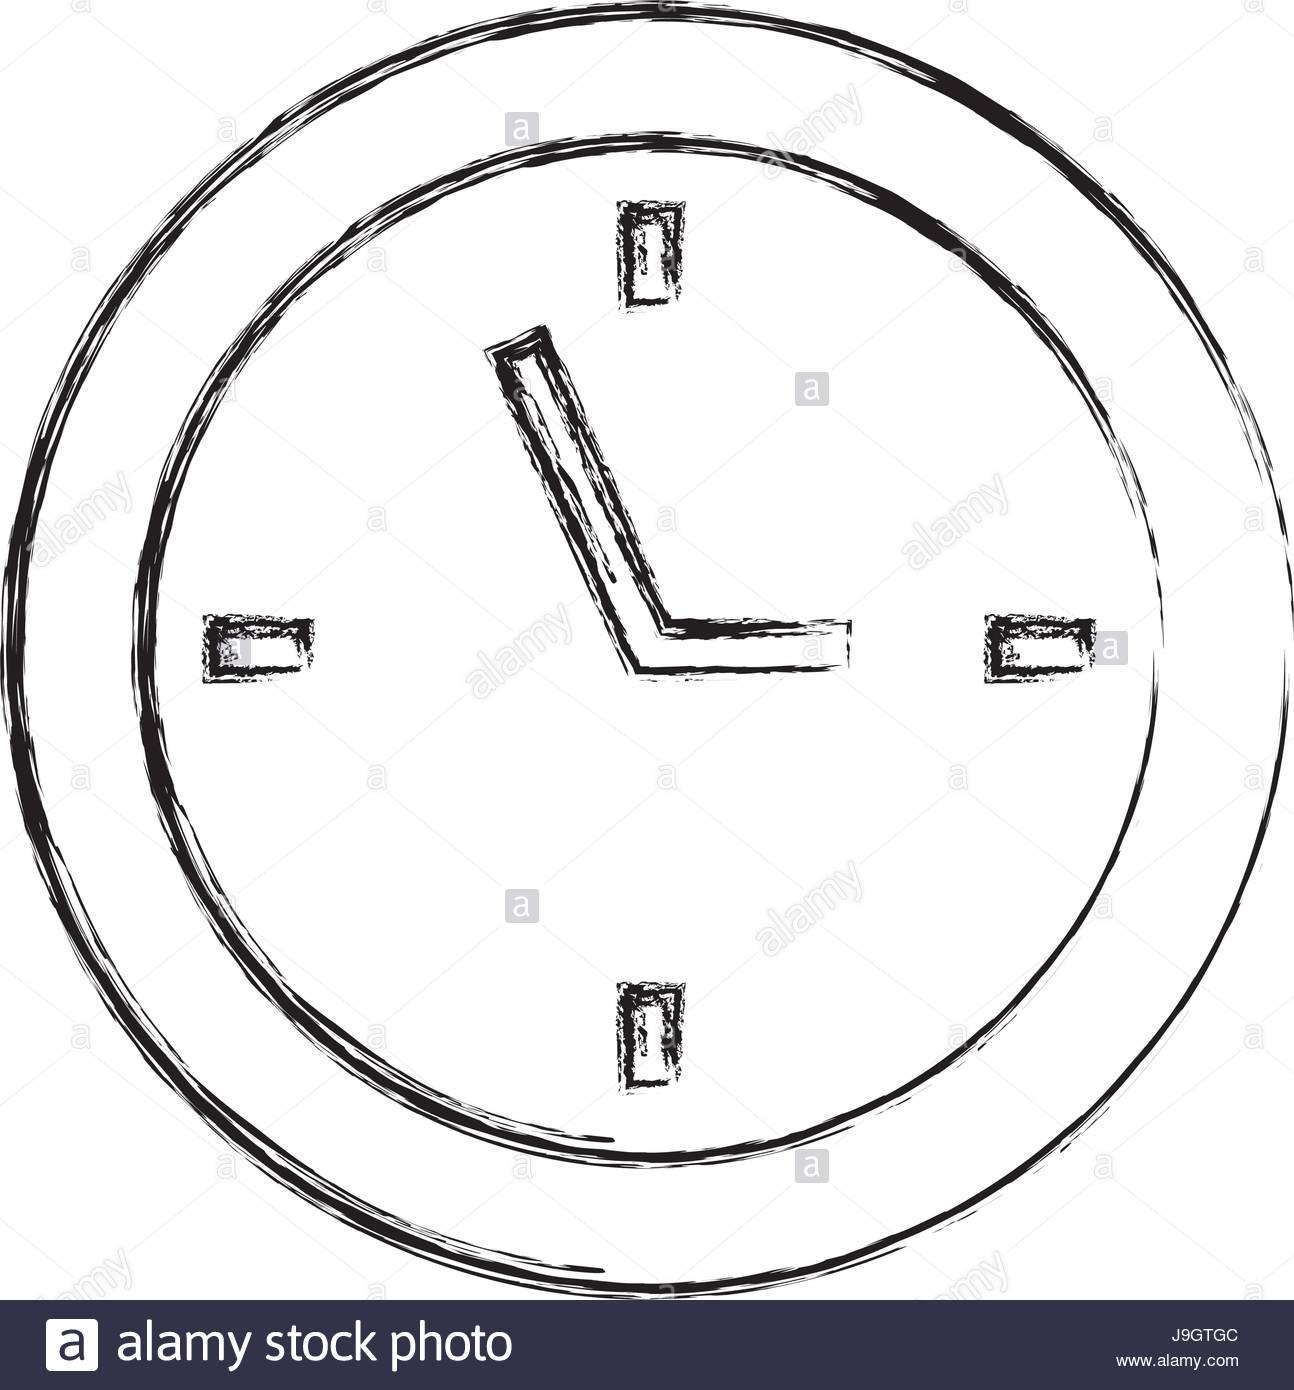 Dessiner Croquis Dessin D'horloge Vecteurs Et Illustration à Dessin D Horloge